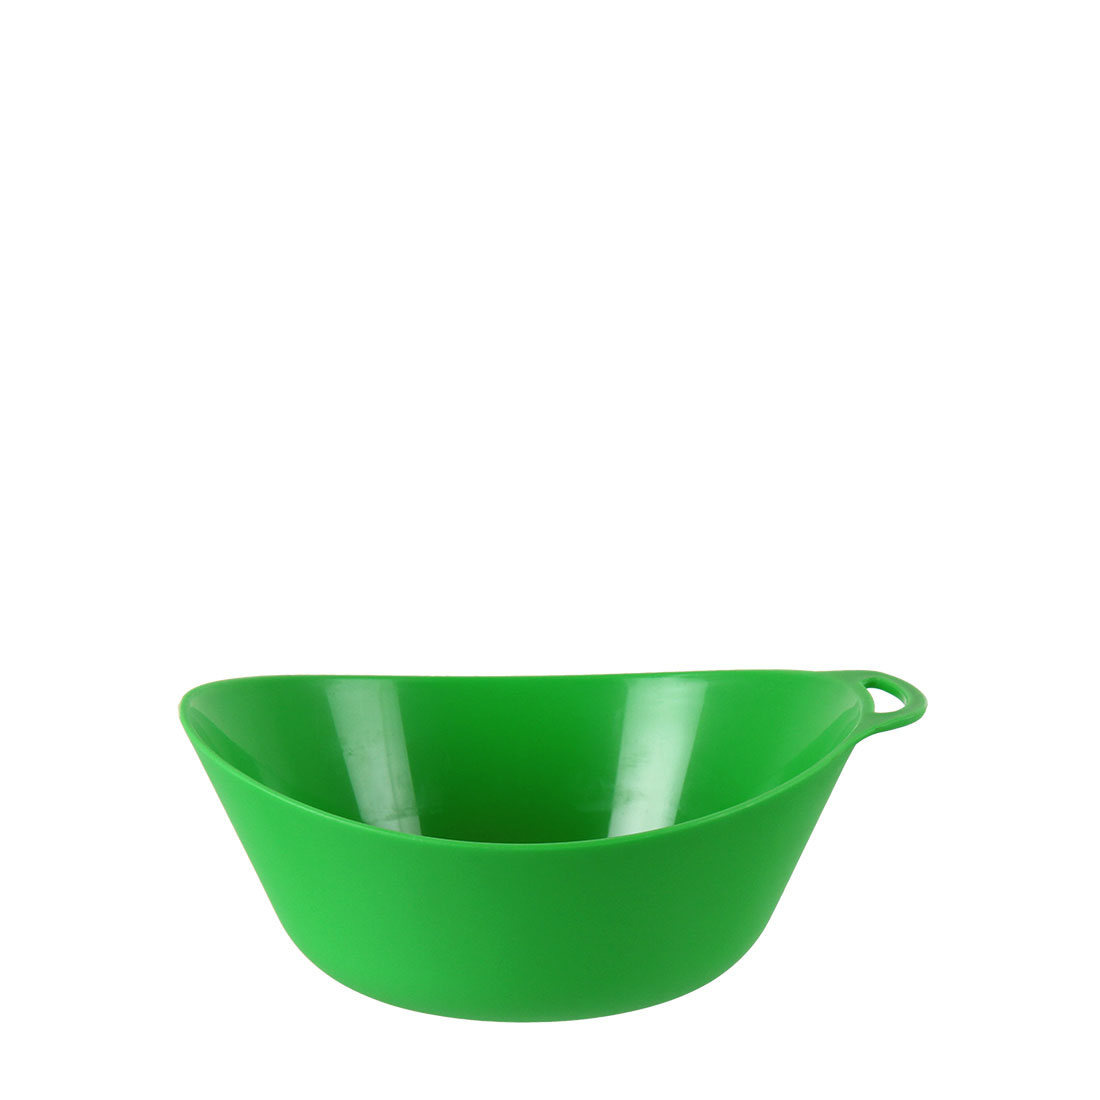 Ellipse Camping Bowl (green)